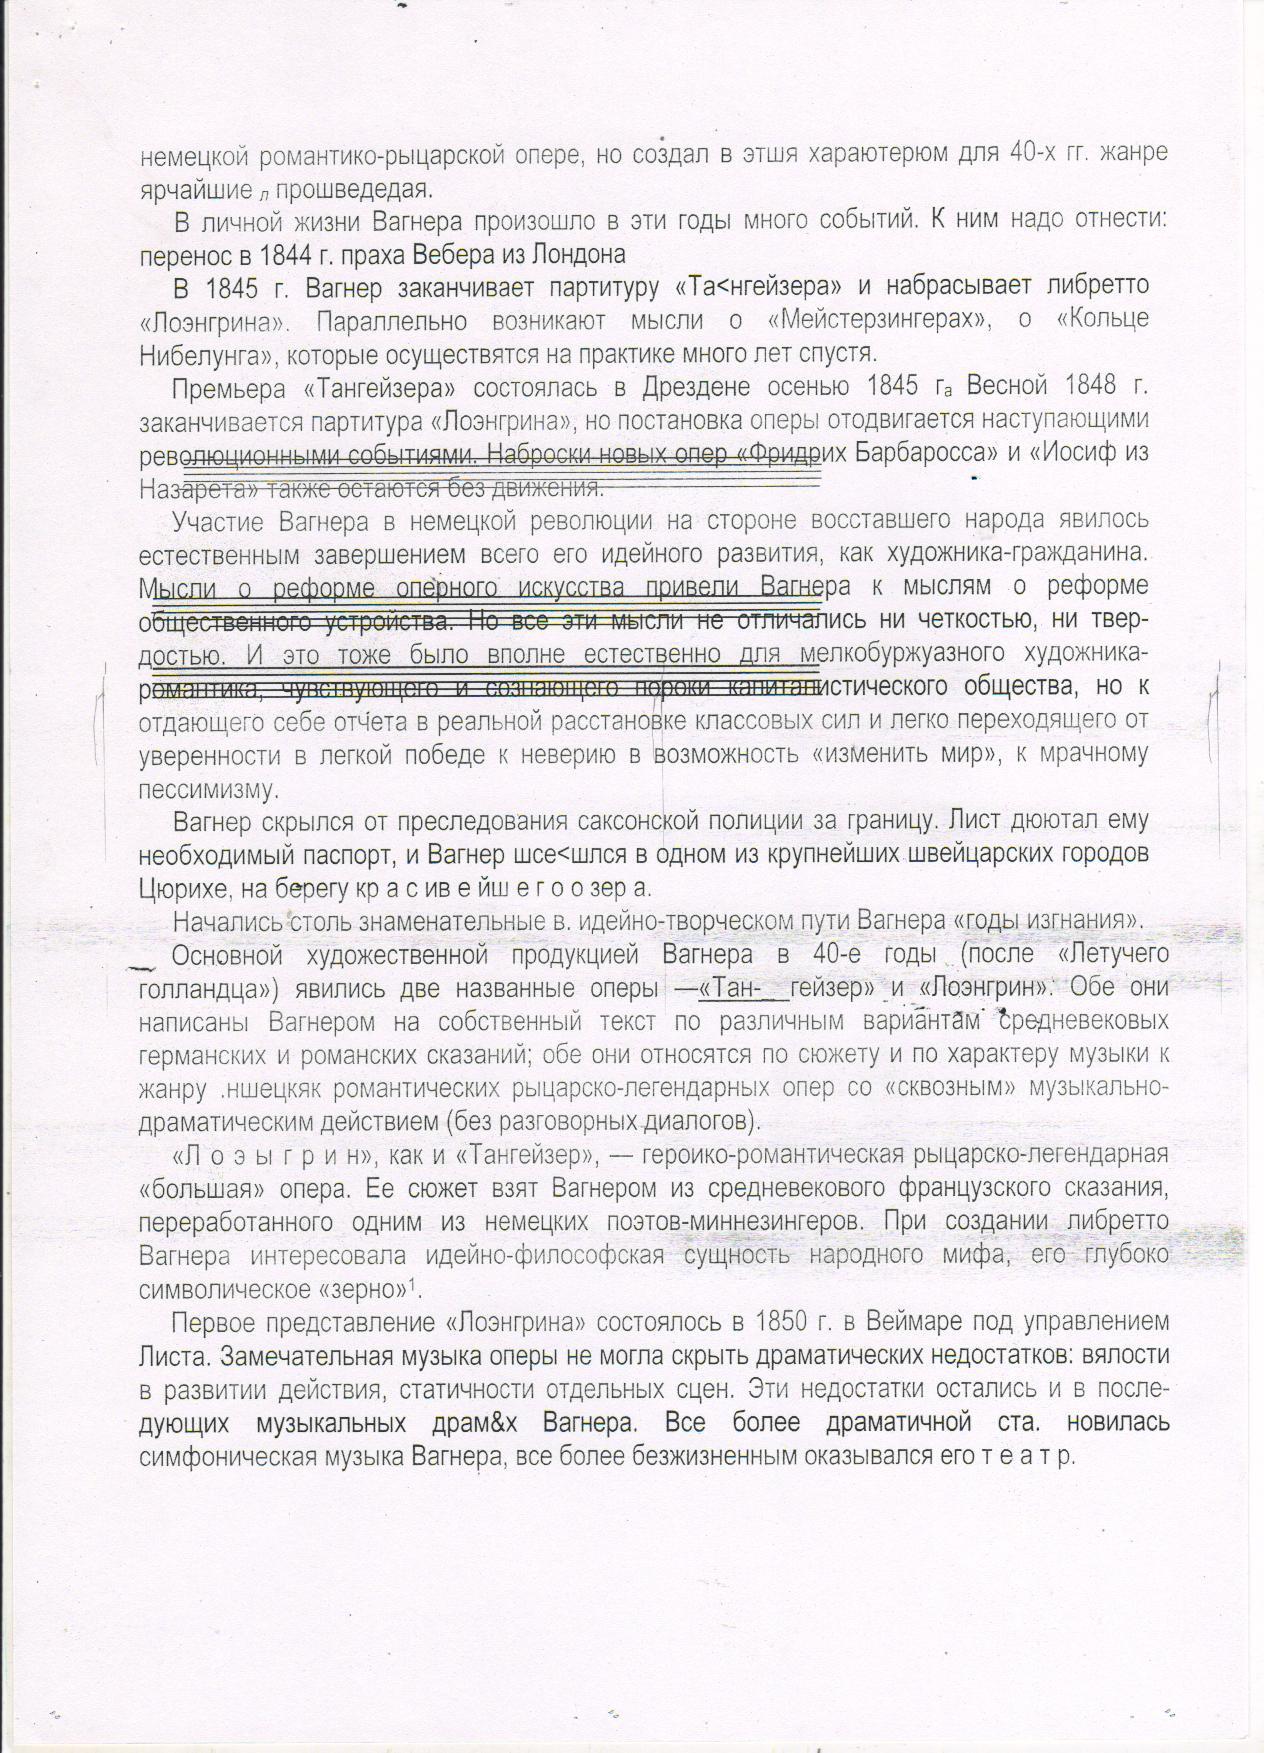 C:\Documents and Settings\Учитель\Рабочий стол\6.jpg